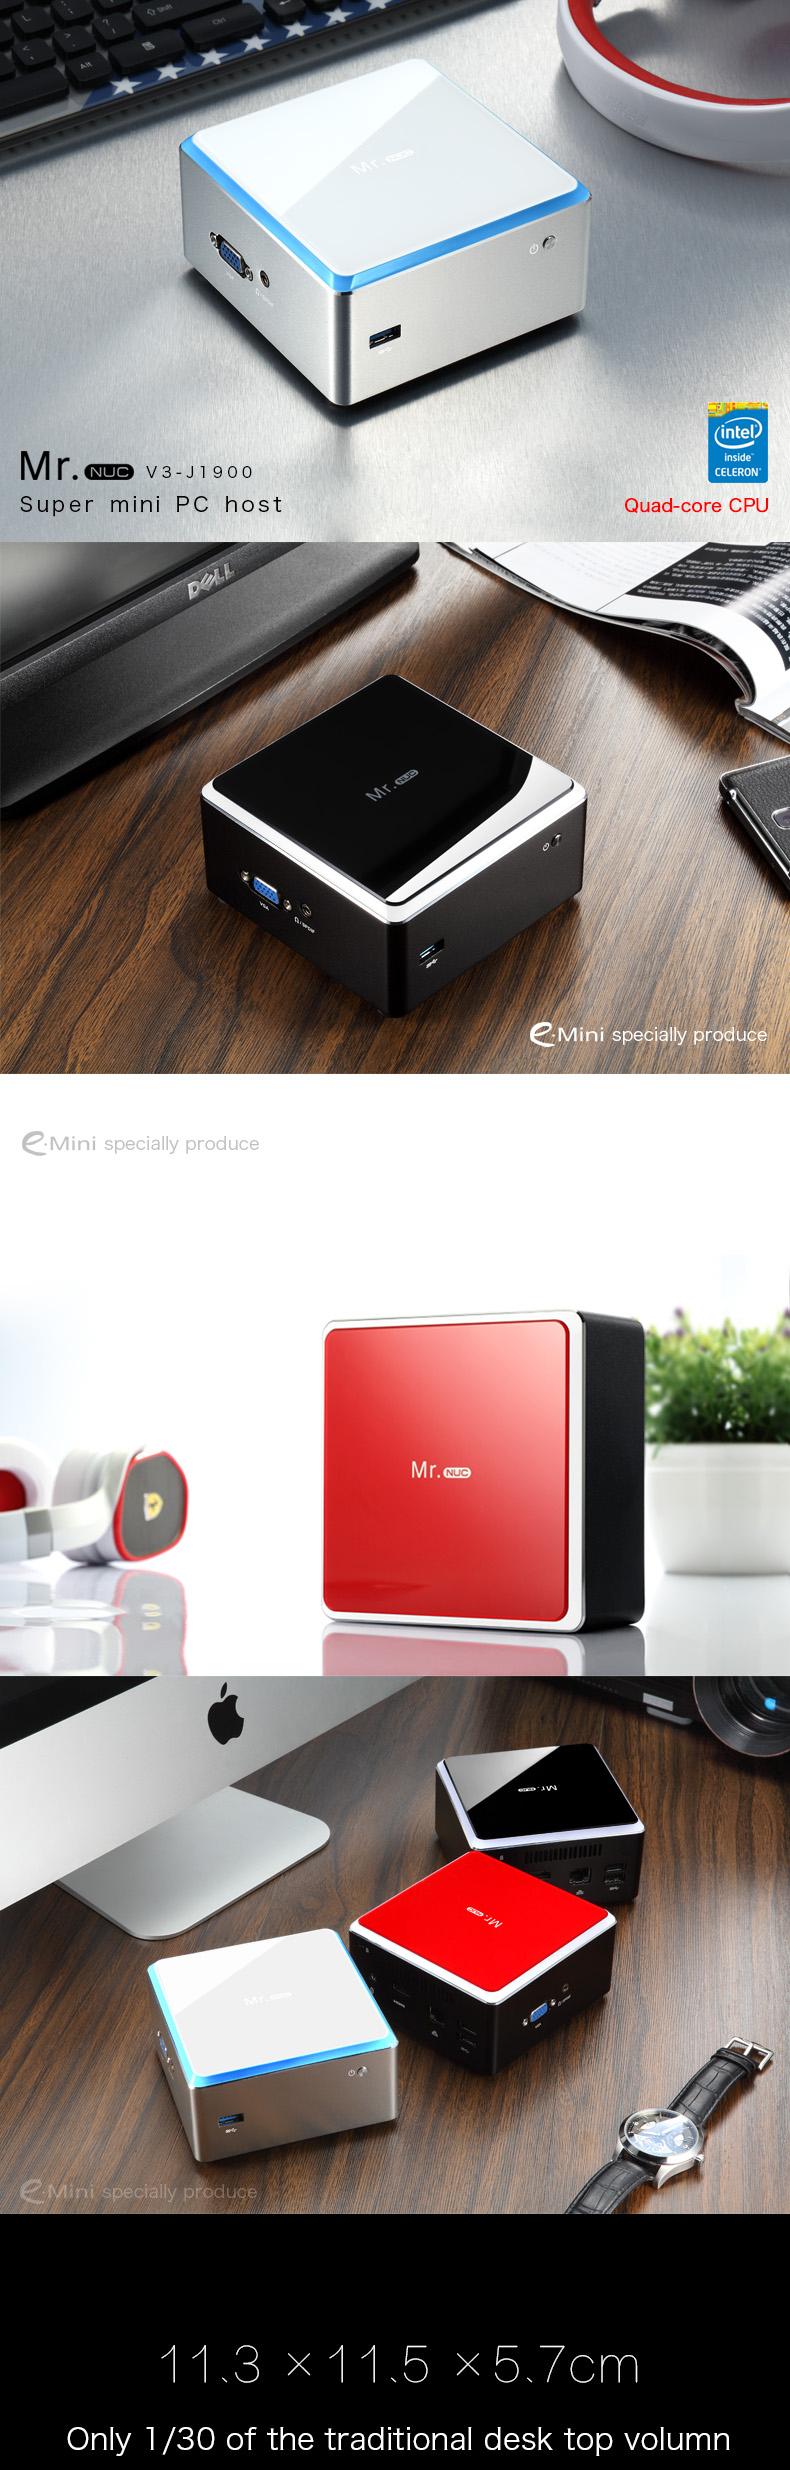 New Promotion Miracast Quad Core Mini Pc Win Xp - Buy Mini Pc,Mini Pc Win  Xp,Miracast Quad Core Mini Pc Win Xp Product on Alibaba com